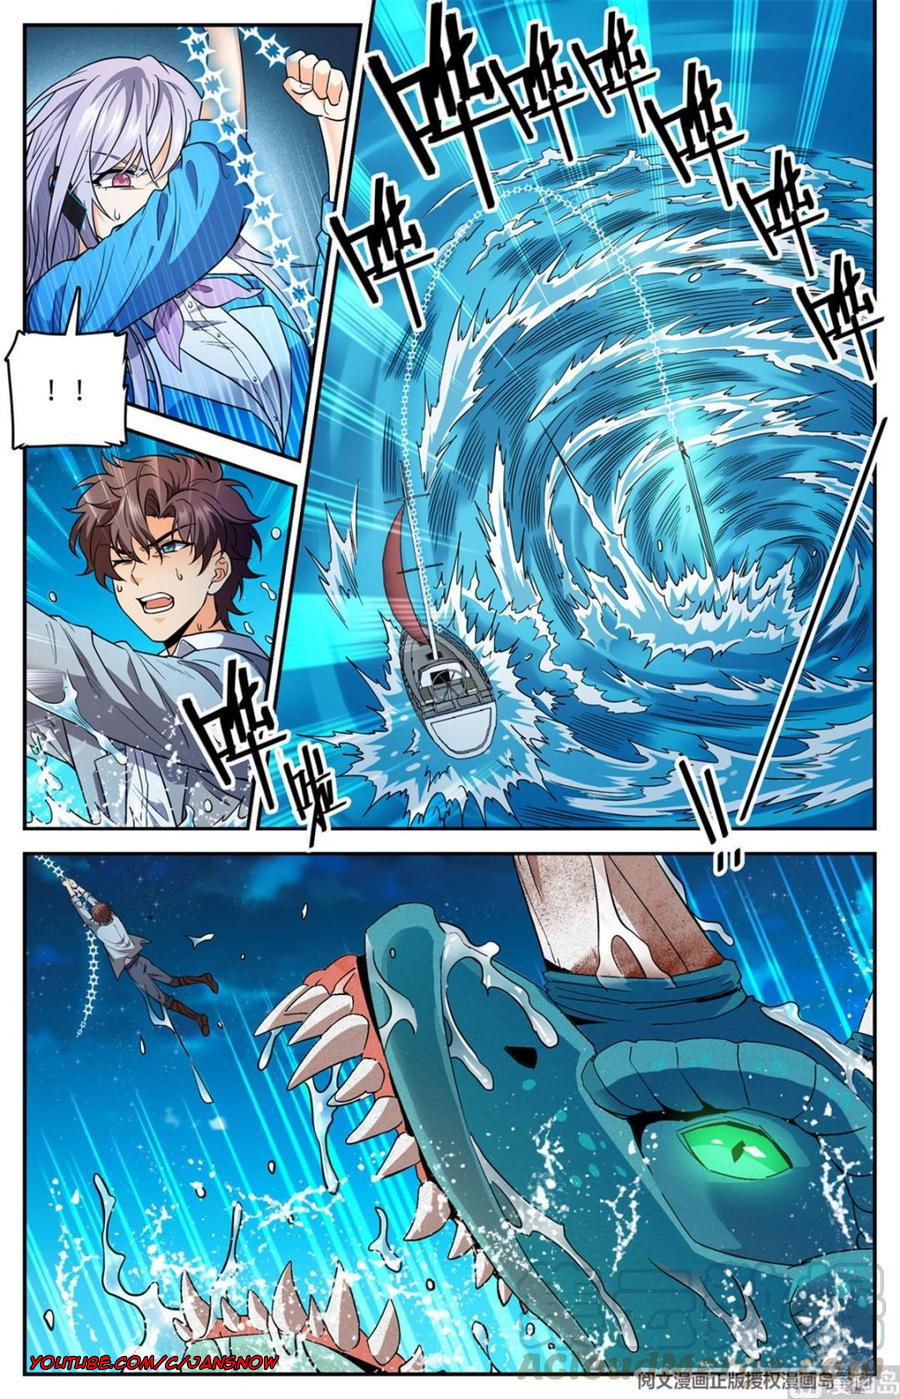 Versatile Mage Chapter 647 page 11 - Mangakakalots.com